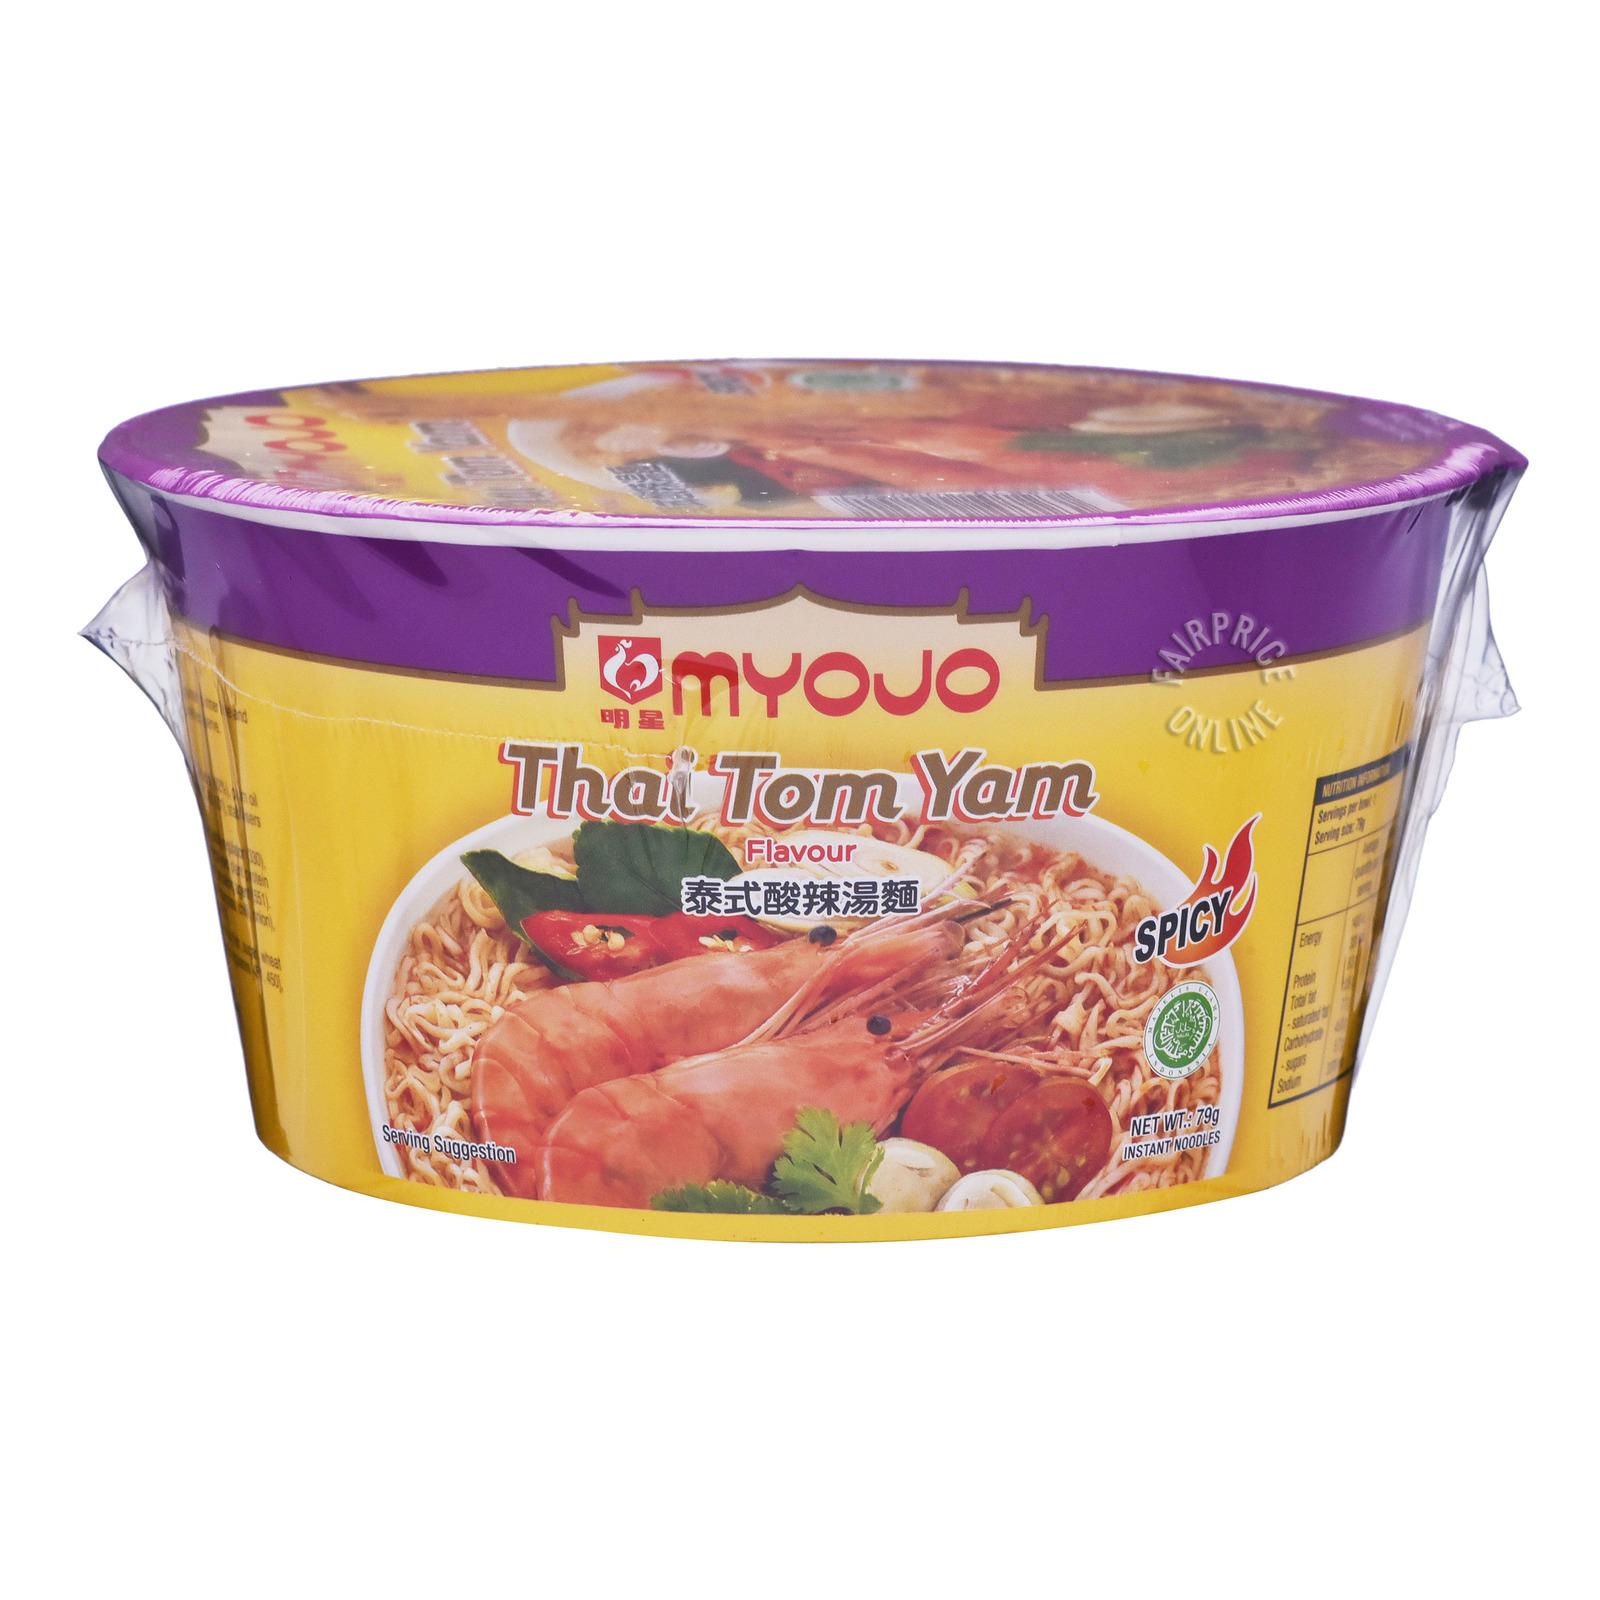 Myojo Instant Bowl Noodles - Thai Tom Yam